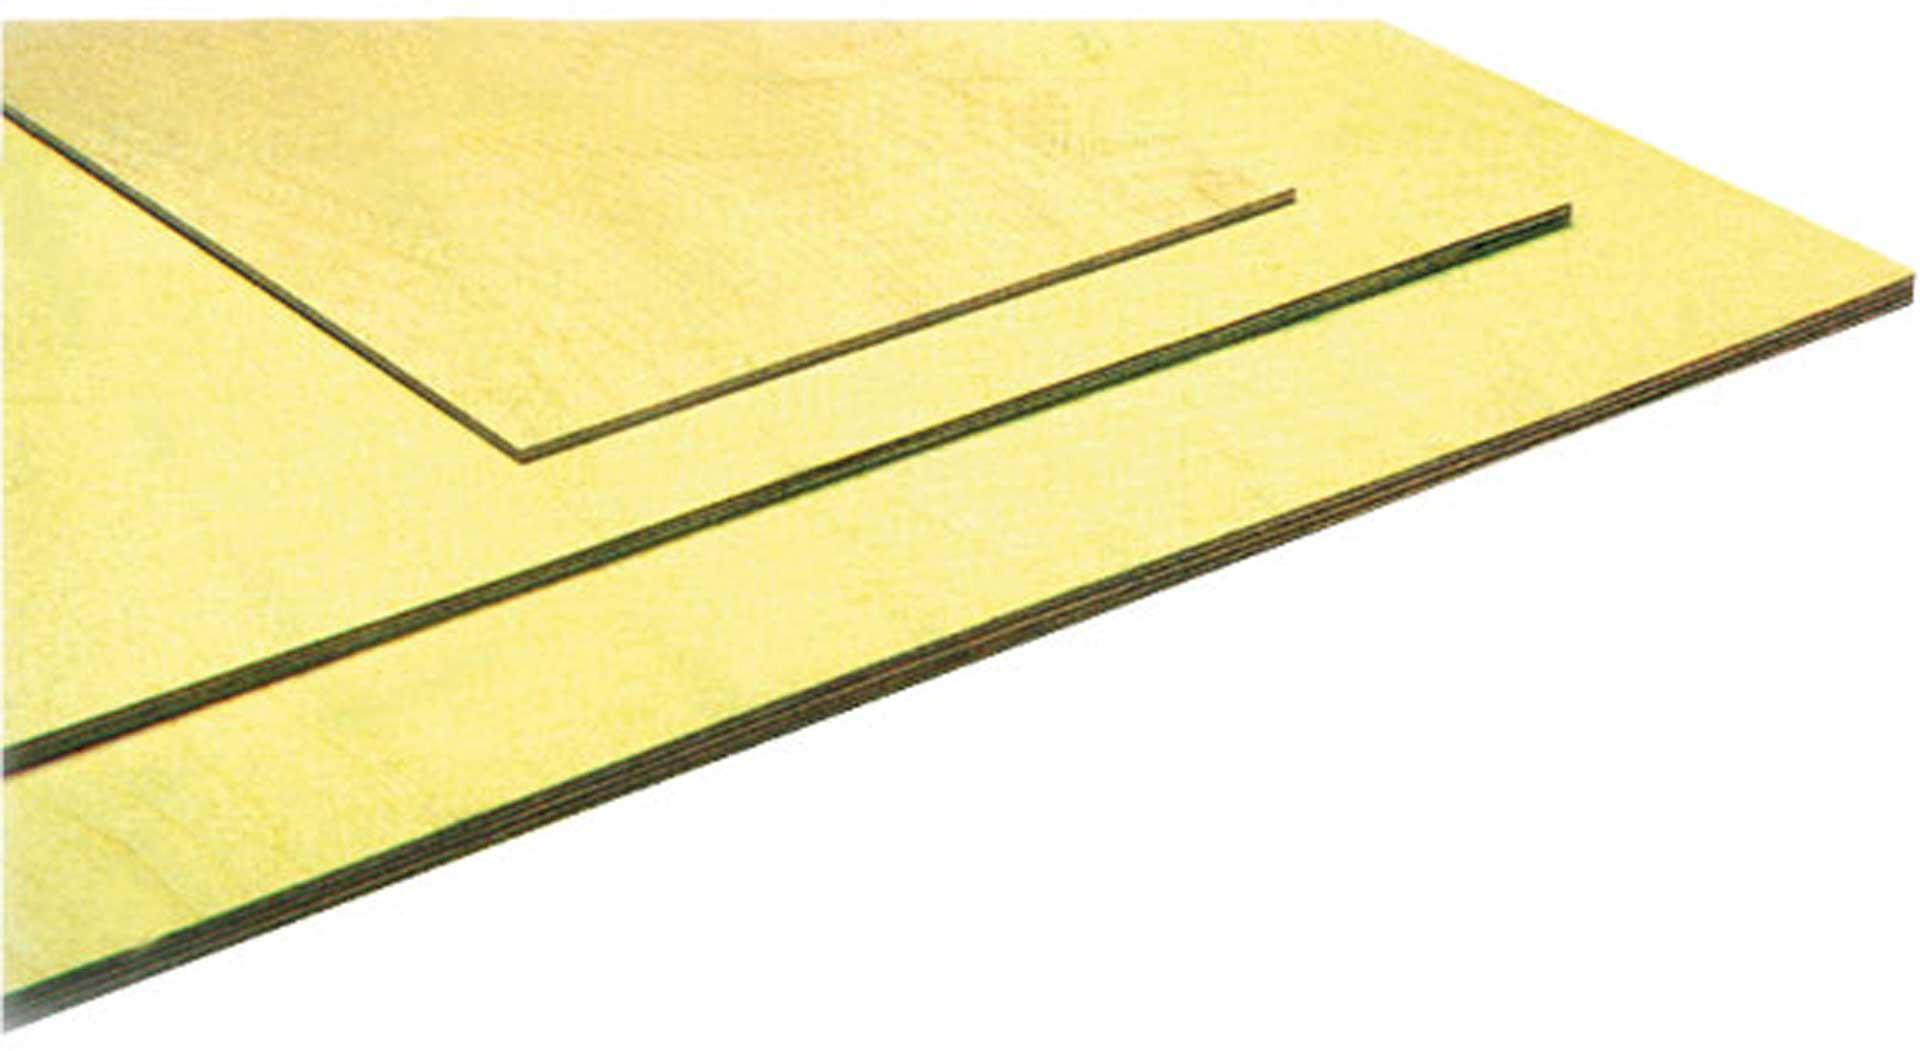 MODELLBAU LINDINGER BIRCH-SPERRY 1,0/300/1000MM